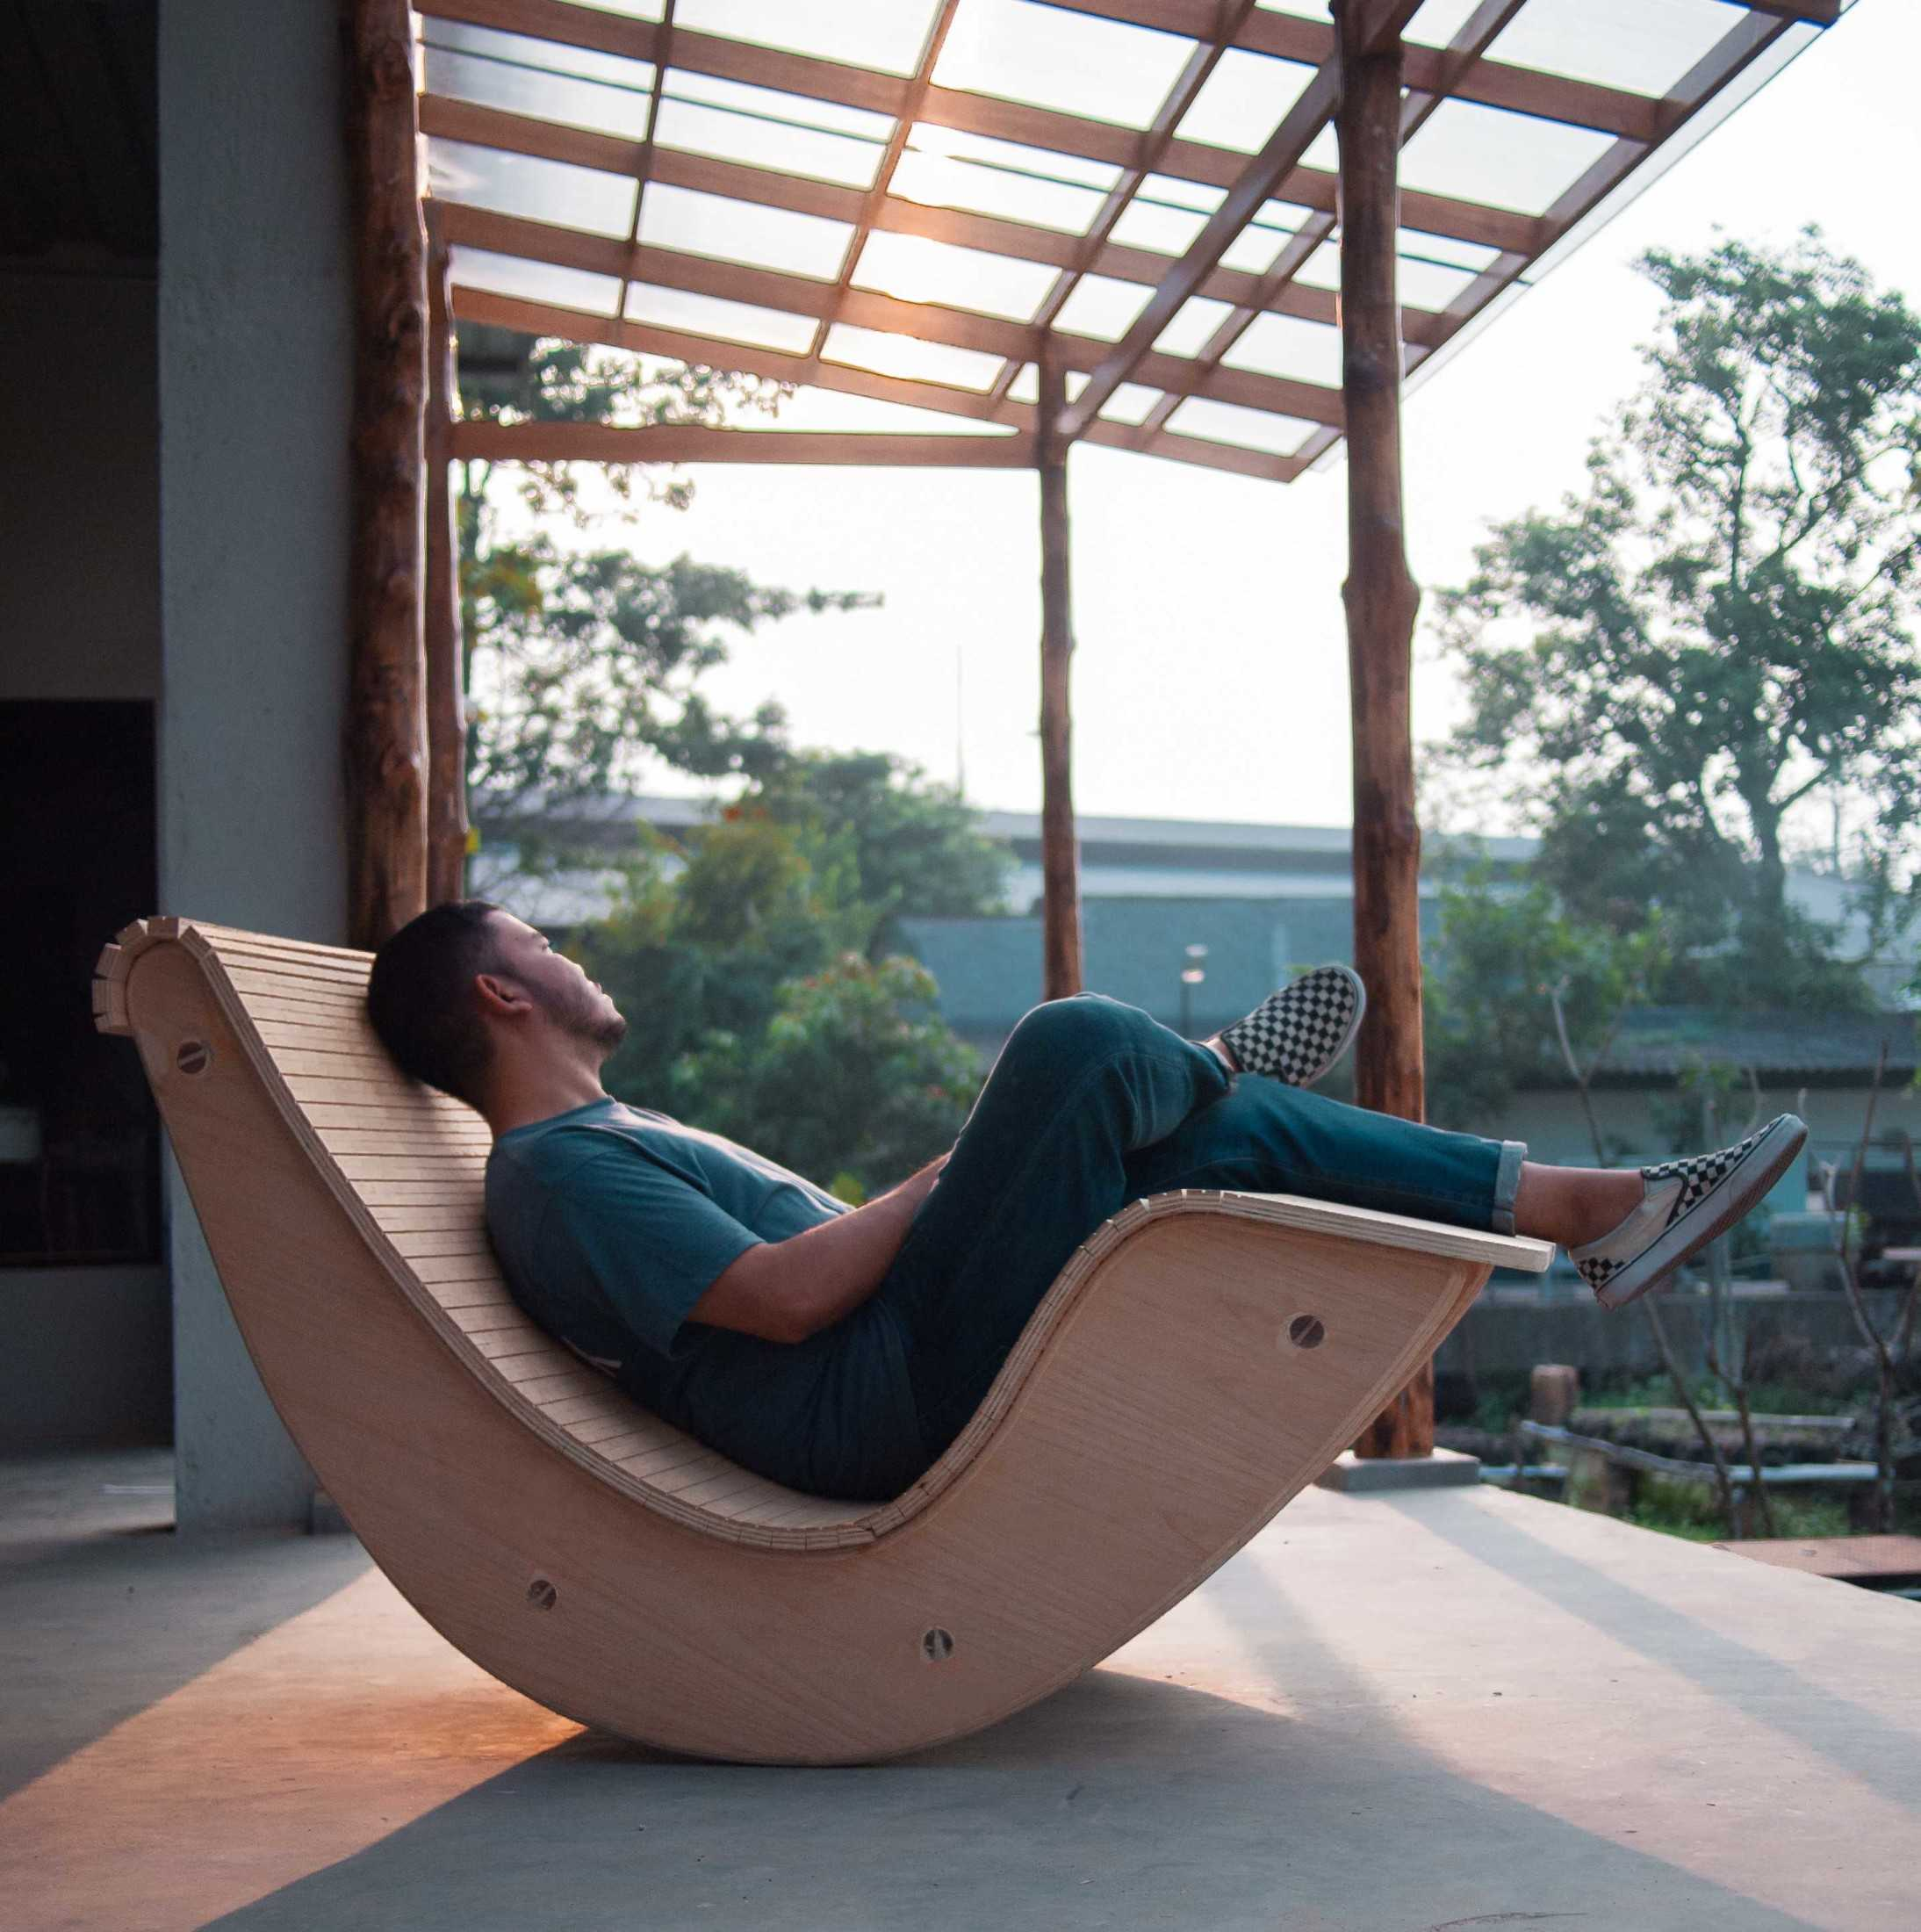 Rootslab Furniture & Craft Project Bekasi, Kota Bks, Jawa Barat, Indonesia Bekasi, Kota Bks, Jawa Barat, Indonesia Rocking Chair Contemporary 113013